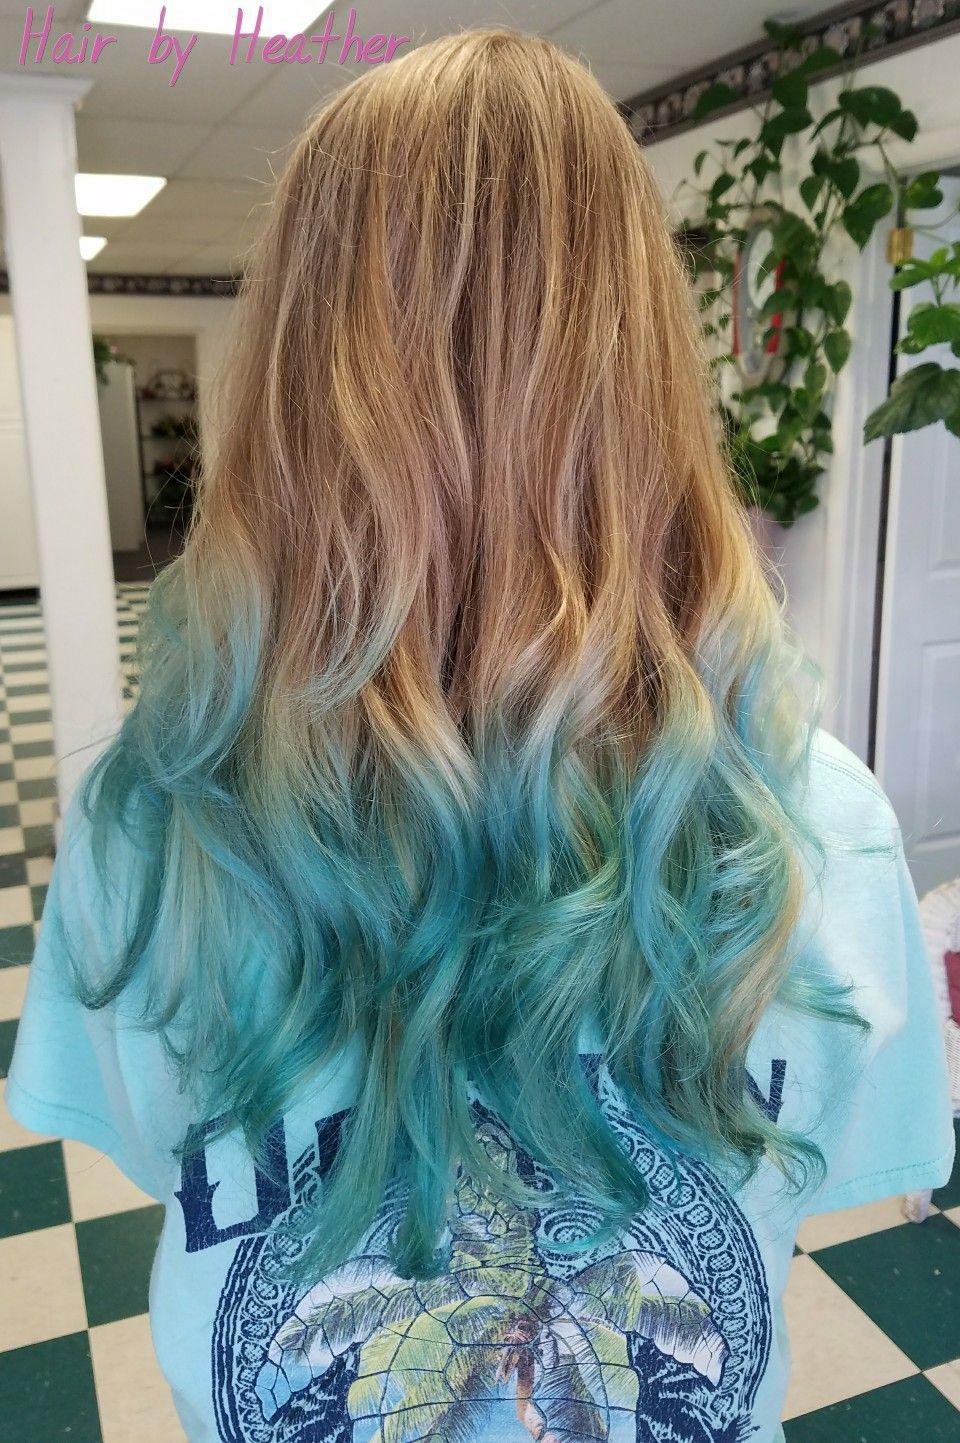 Teal Mermaid Hair Ombre Hair Dye Tips Ombre Hair Blonde Colored Hair Tips